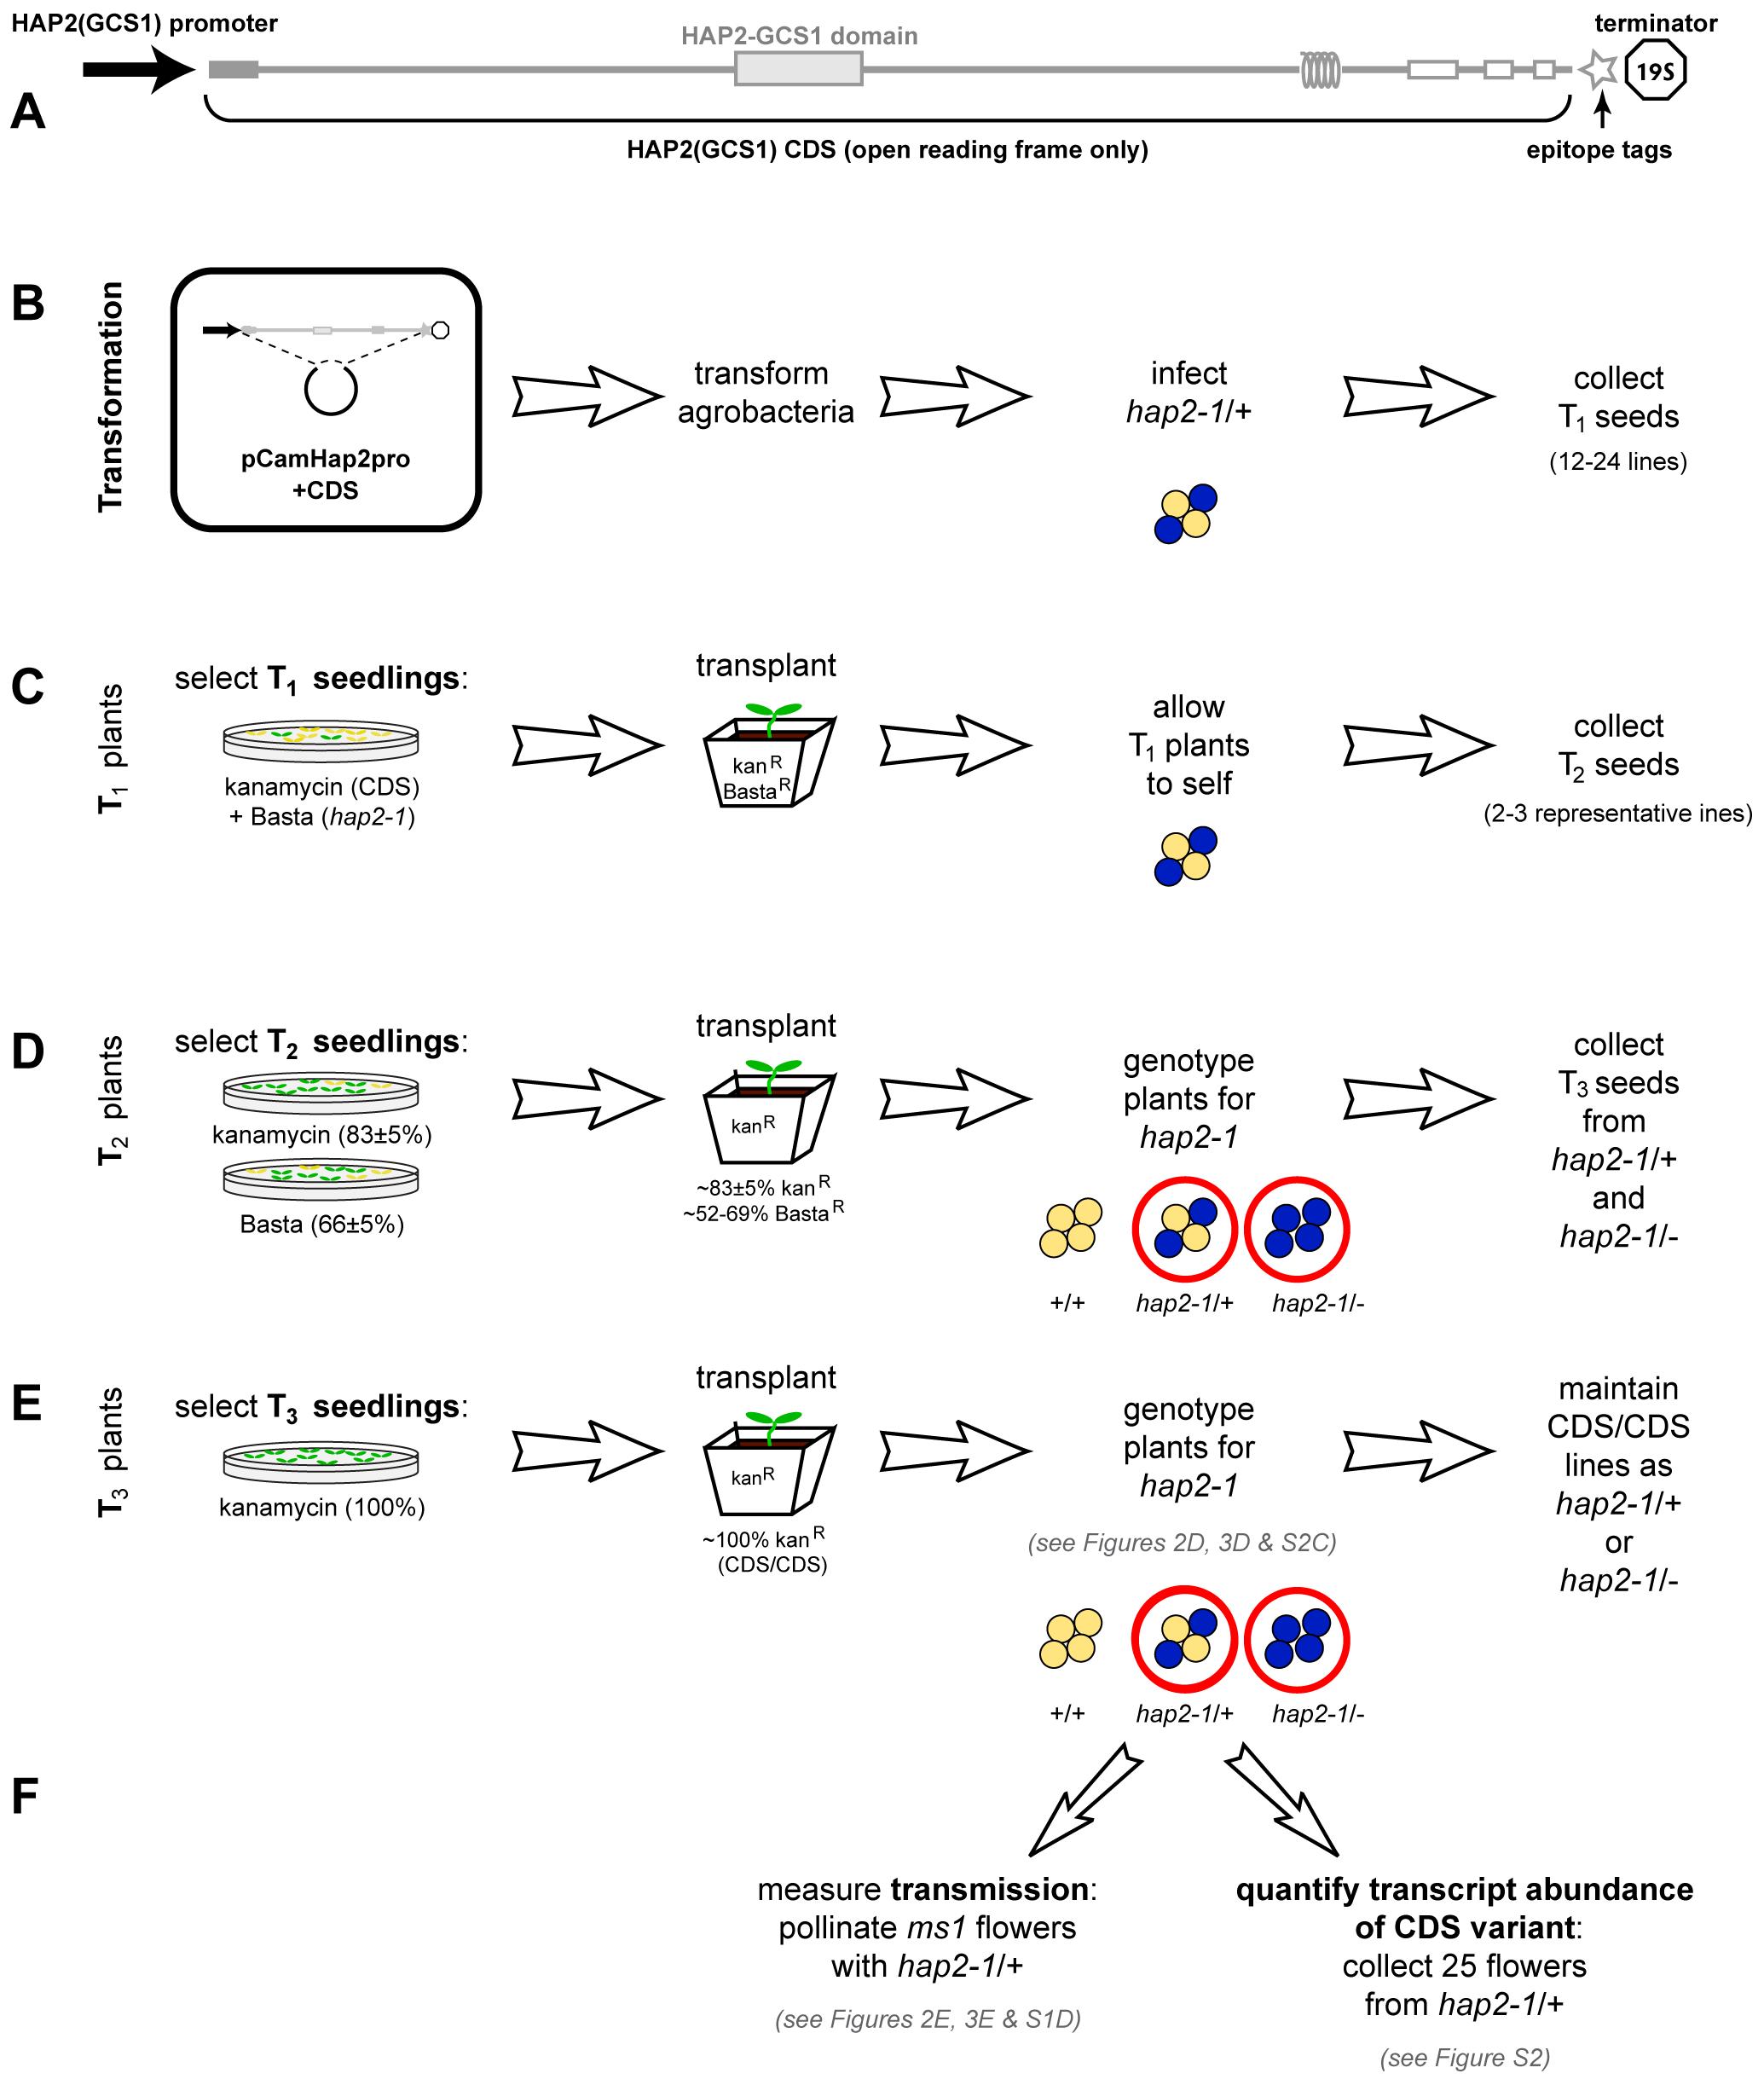 Protocol for analyzing complementation of <i>hap2-1</i> fertilization defects using <i>HAP2(GCS1)</i> CDS variants.